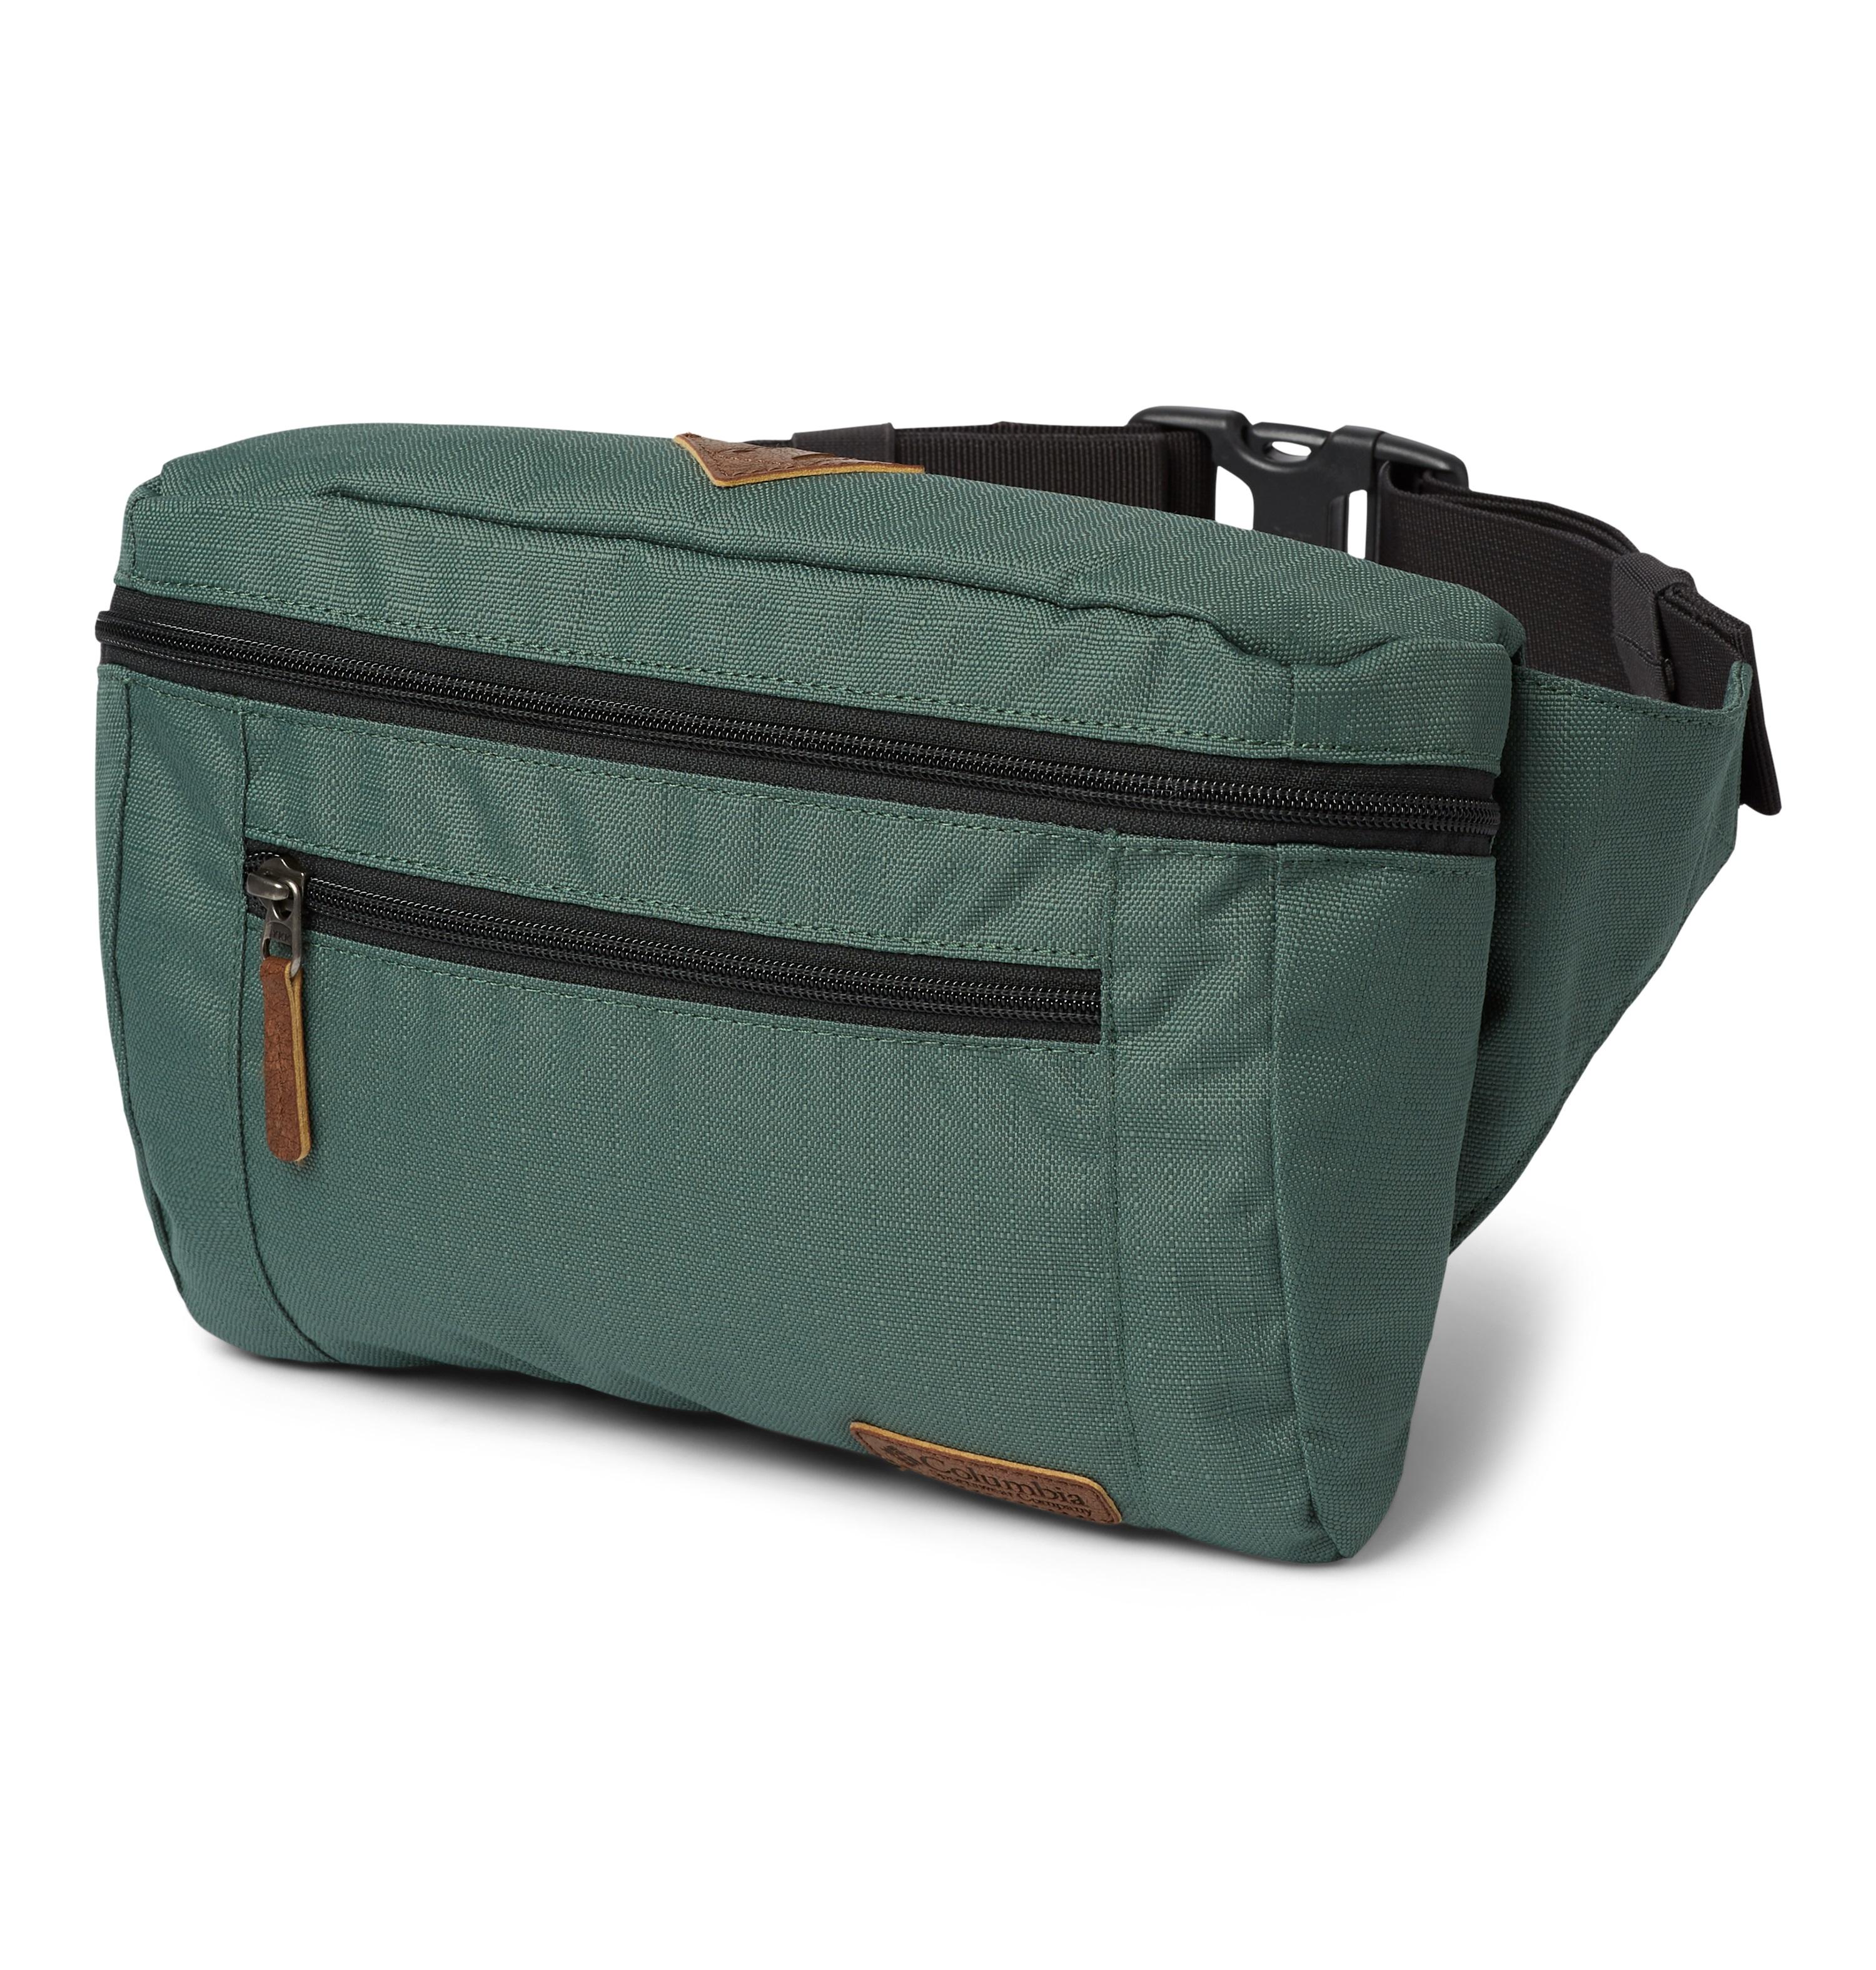 Comprar Columbia Classic Outdoor Bum Bag verde